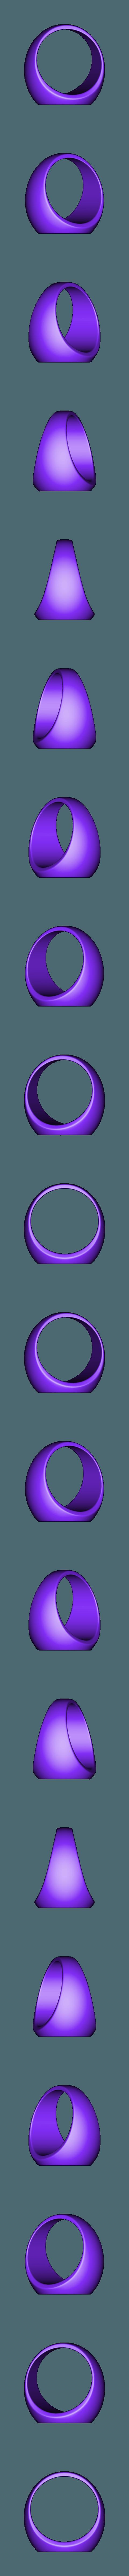 YELLOW LANTERN RING.stl Download free STL file Yellow Lantern Ring • Model to 3D print, roberhlez